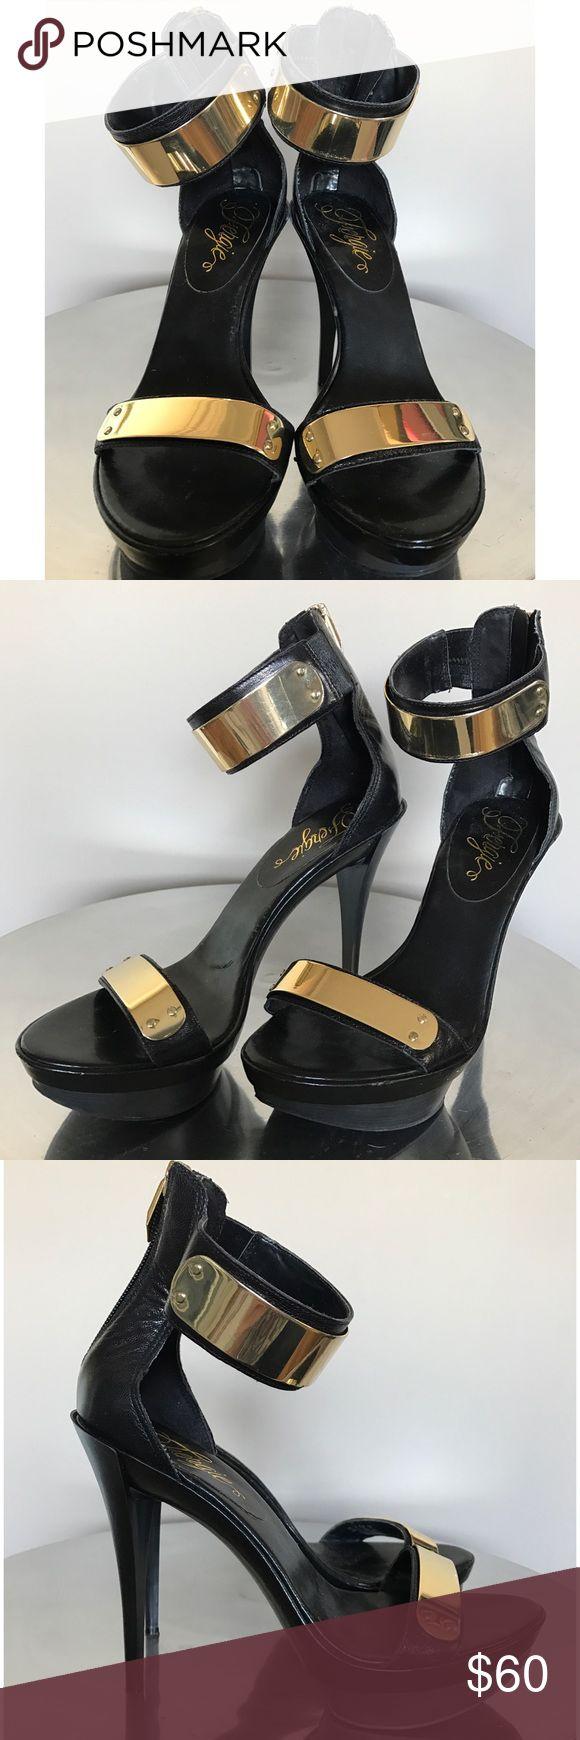 Fergie Gold Plate Heels PreOwned. Platform Heels. Good Condition. Zipper in Back. Fergie Shoes Heels